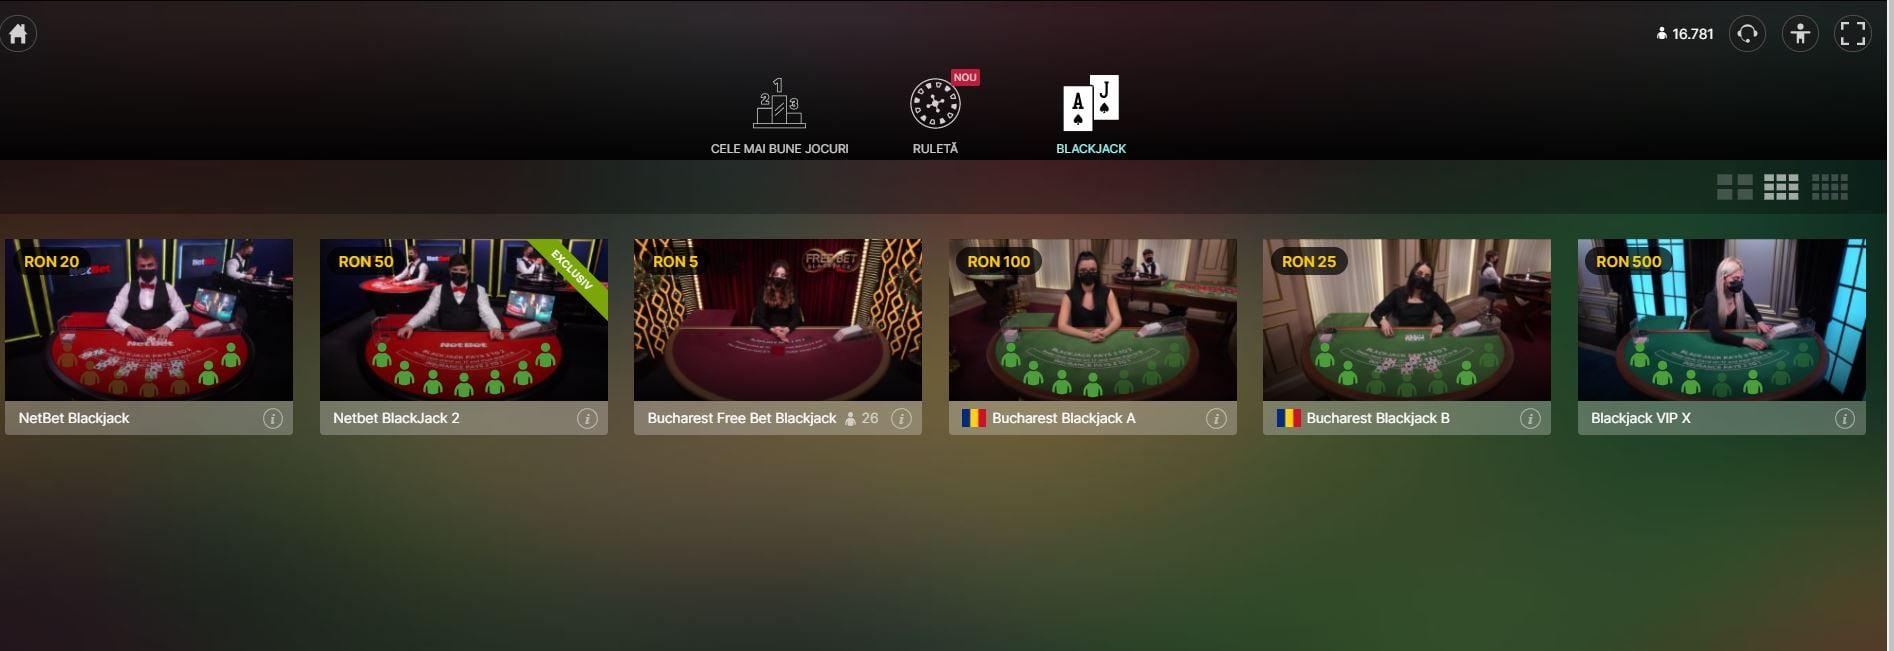 blackjack live netbet casino